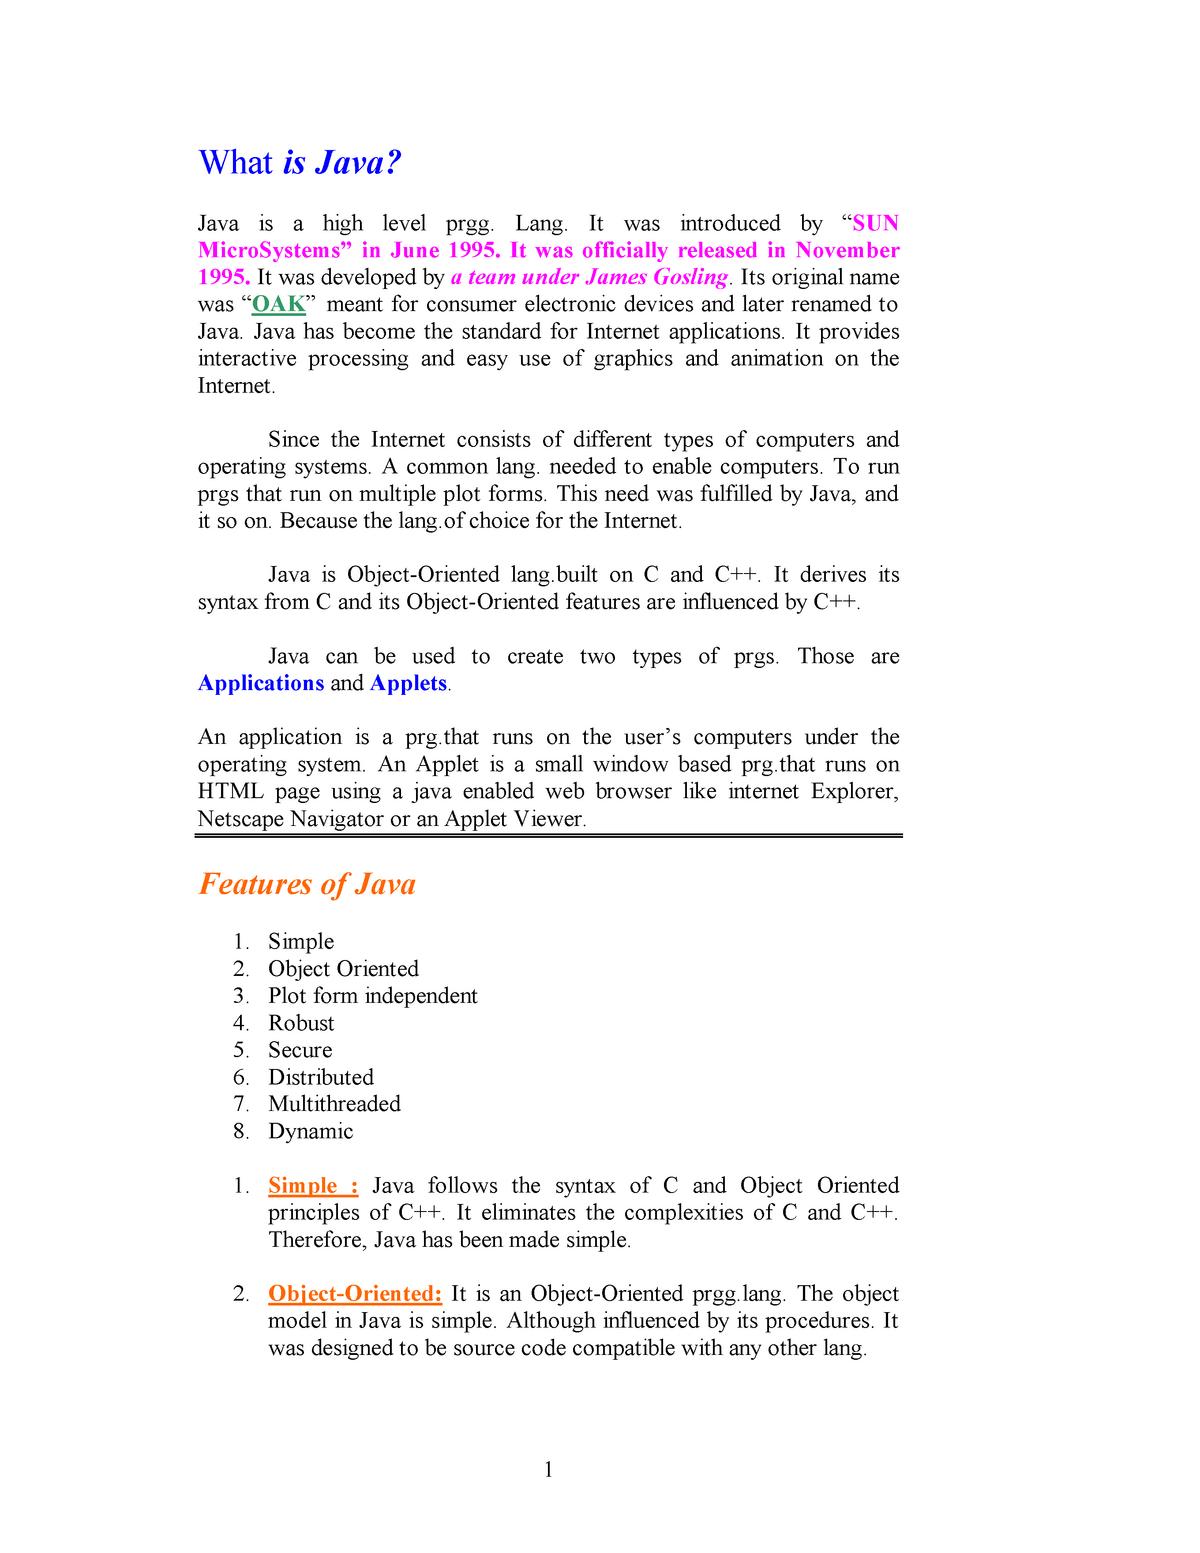 Java Summary - Detailed Notes about JAVA programming - StuDocu